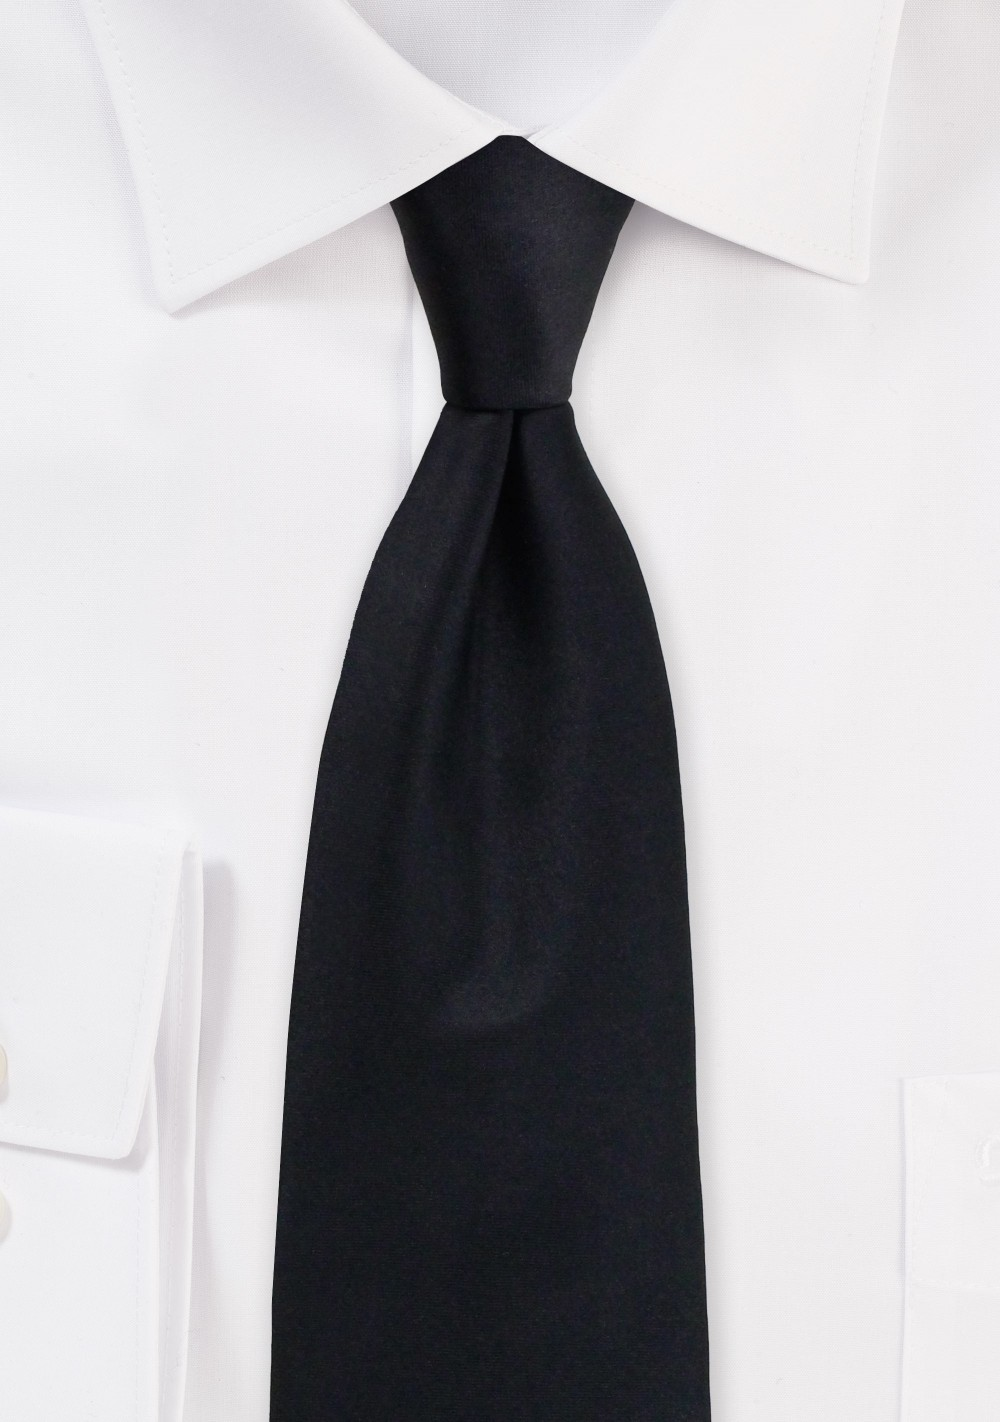 Solid Black Necktie